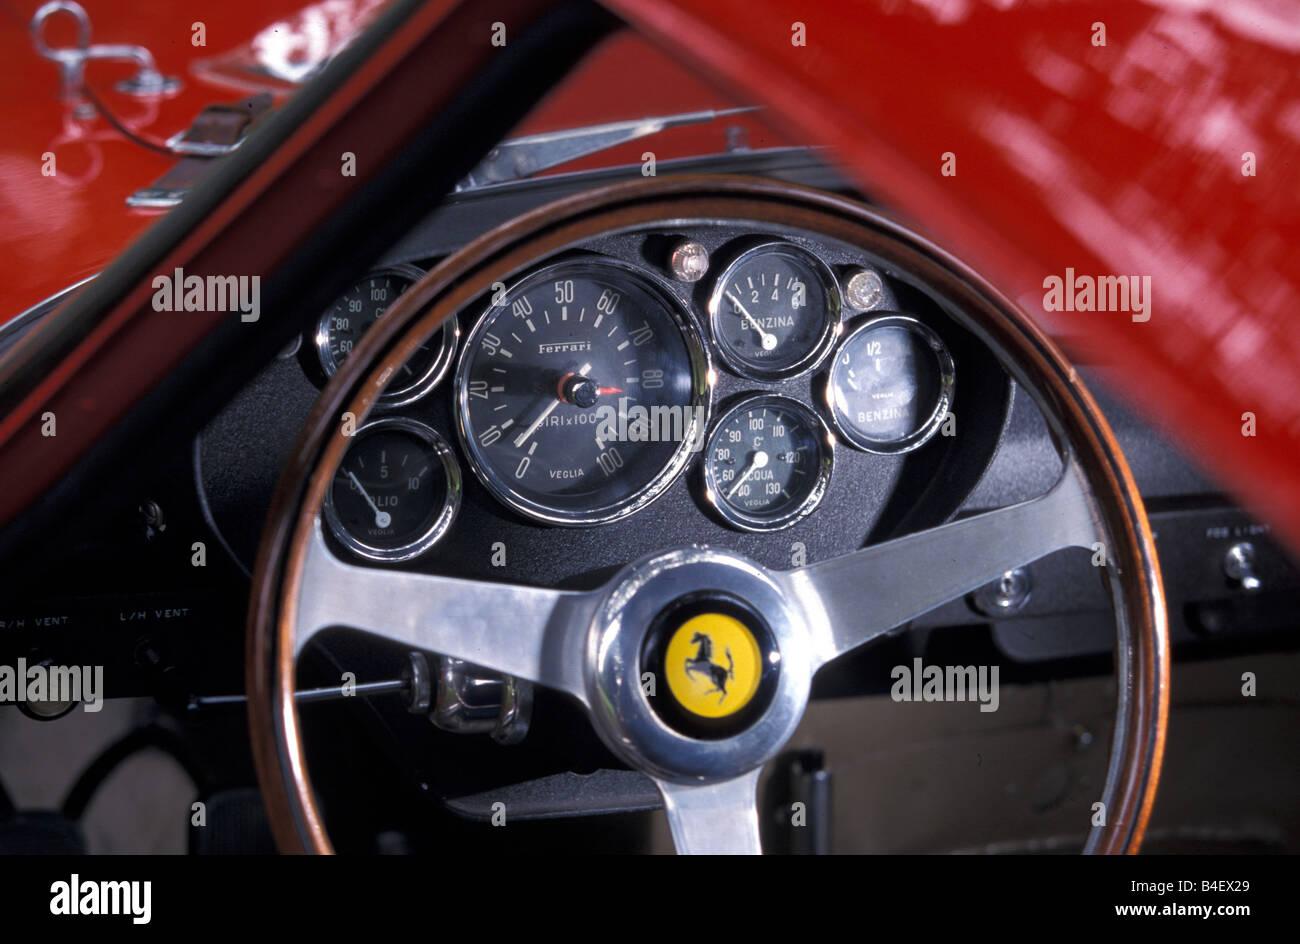 Ferrari Cockpit Stockfotos & Ferrari Cockpit Bilder - Alamy